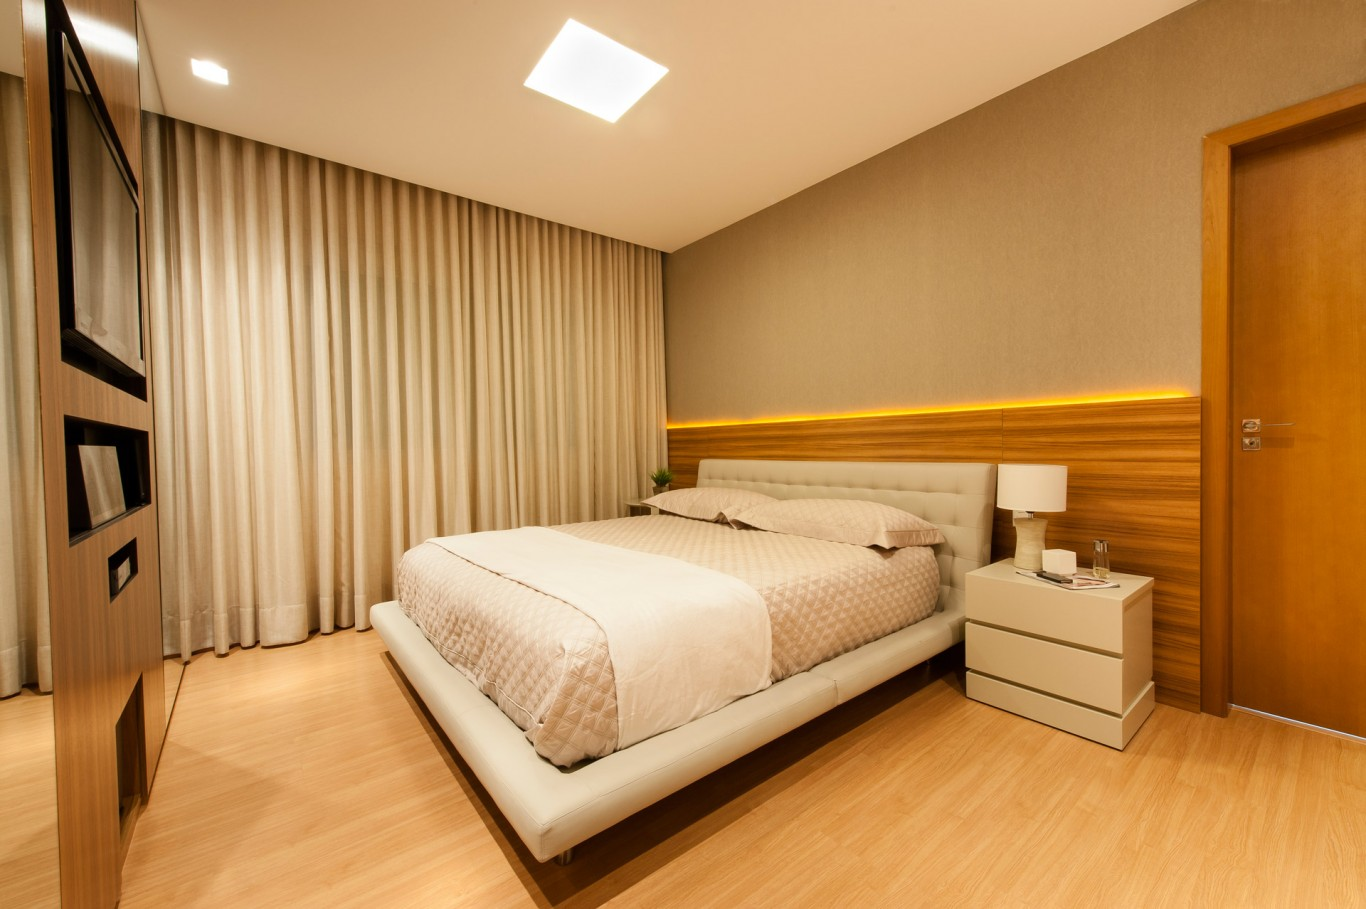 Apartamento Vidal - Quarto Casal